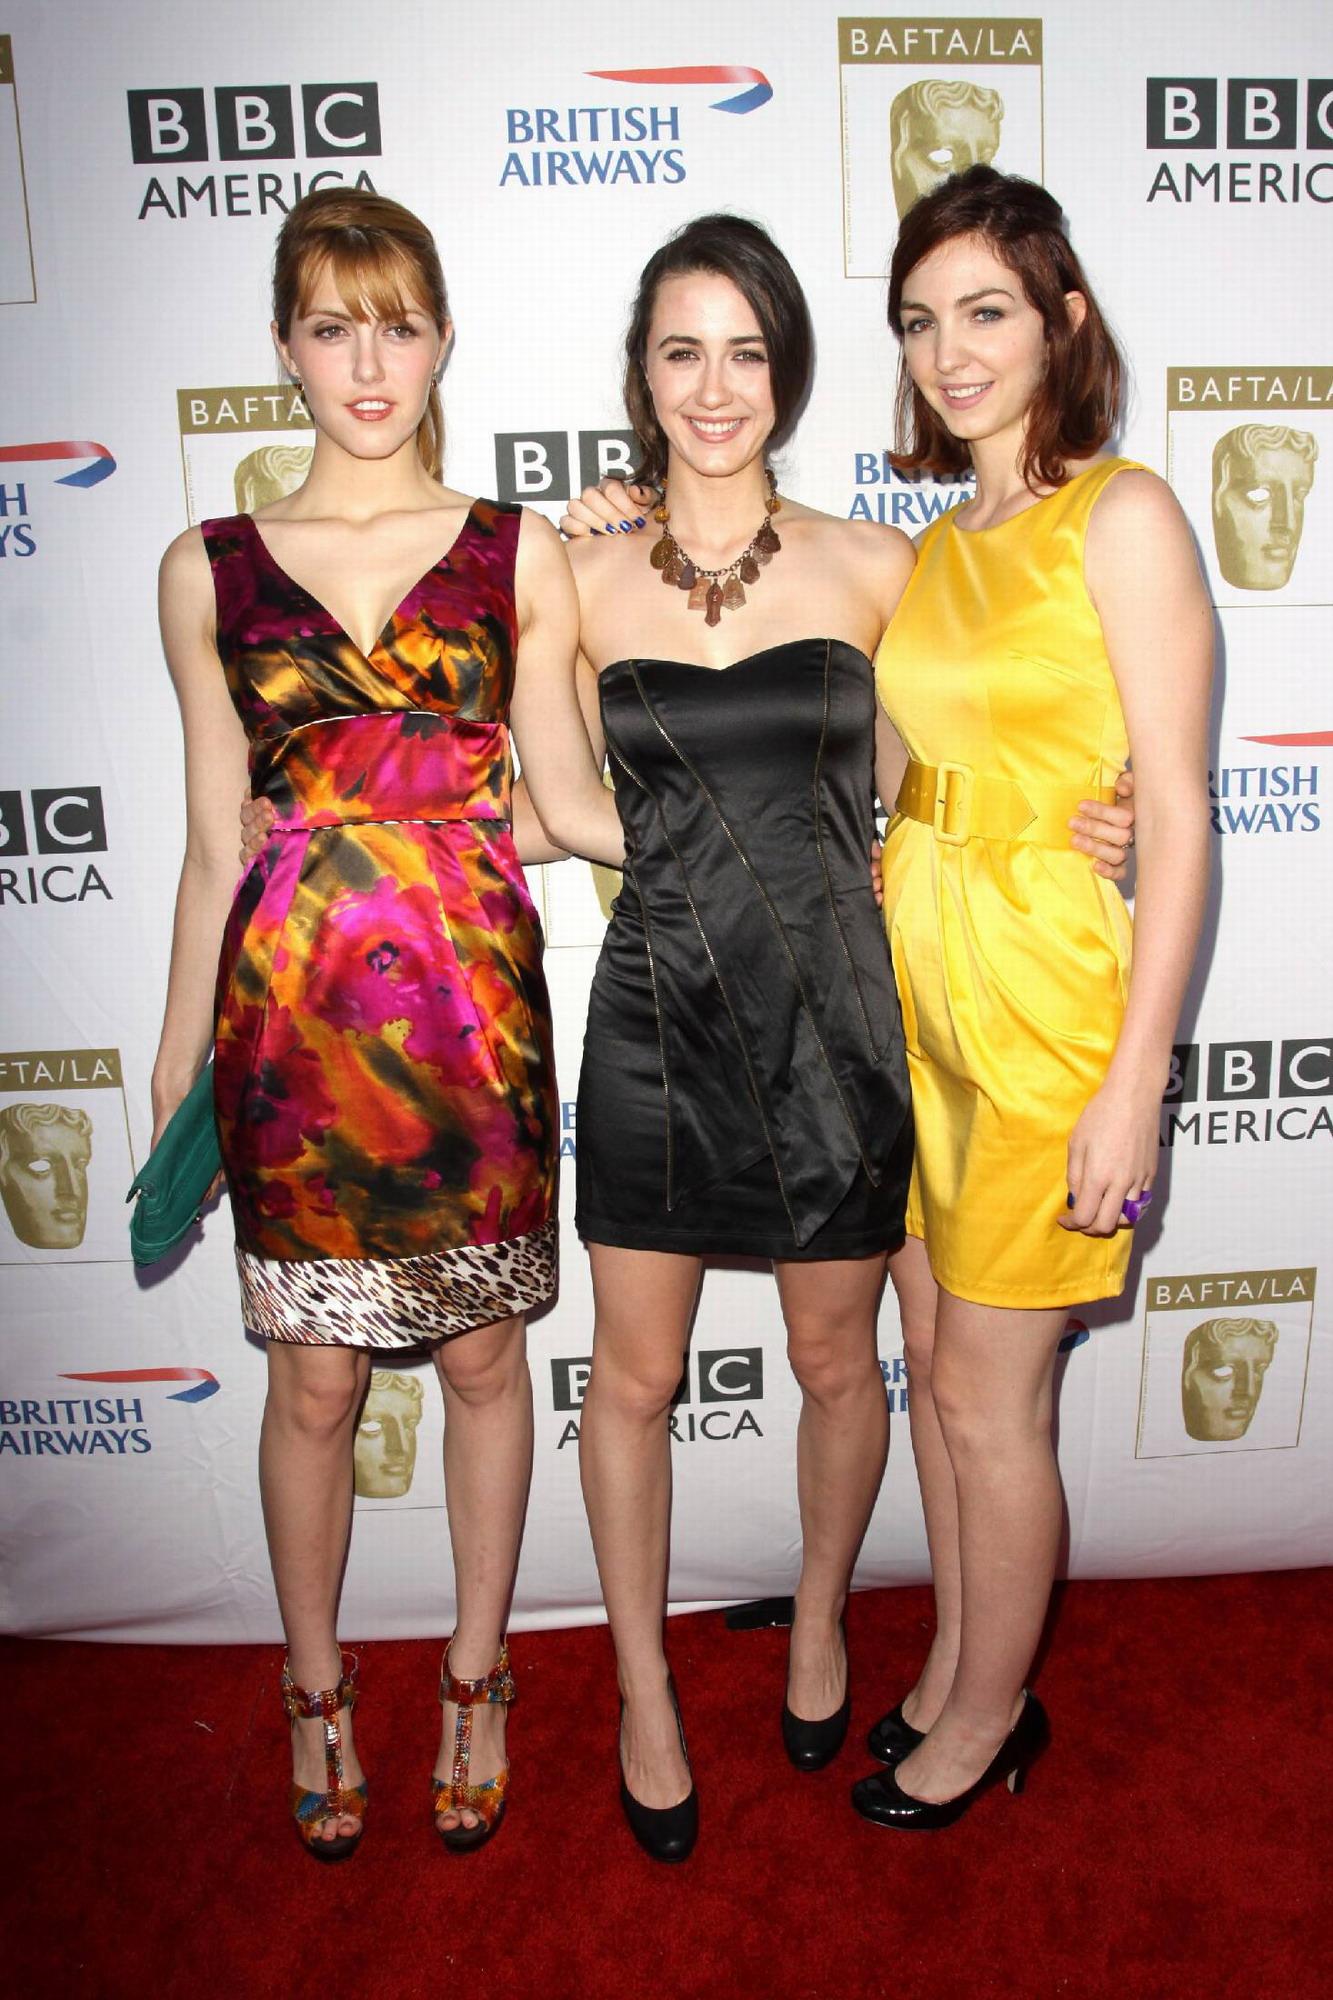 Karen Robson,Jessie Cave (born 1987) Erotic clip Elspeth Ballantyne,Bianca King (b. 1985)